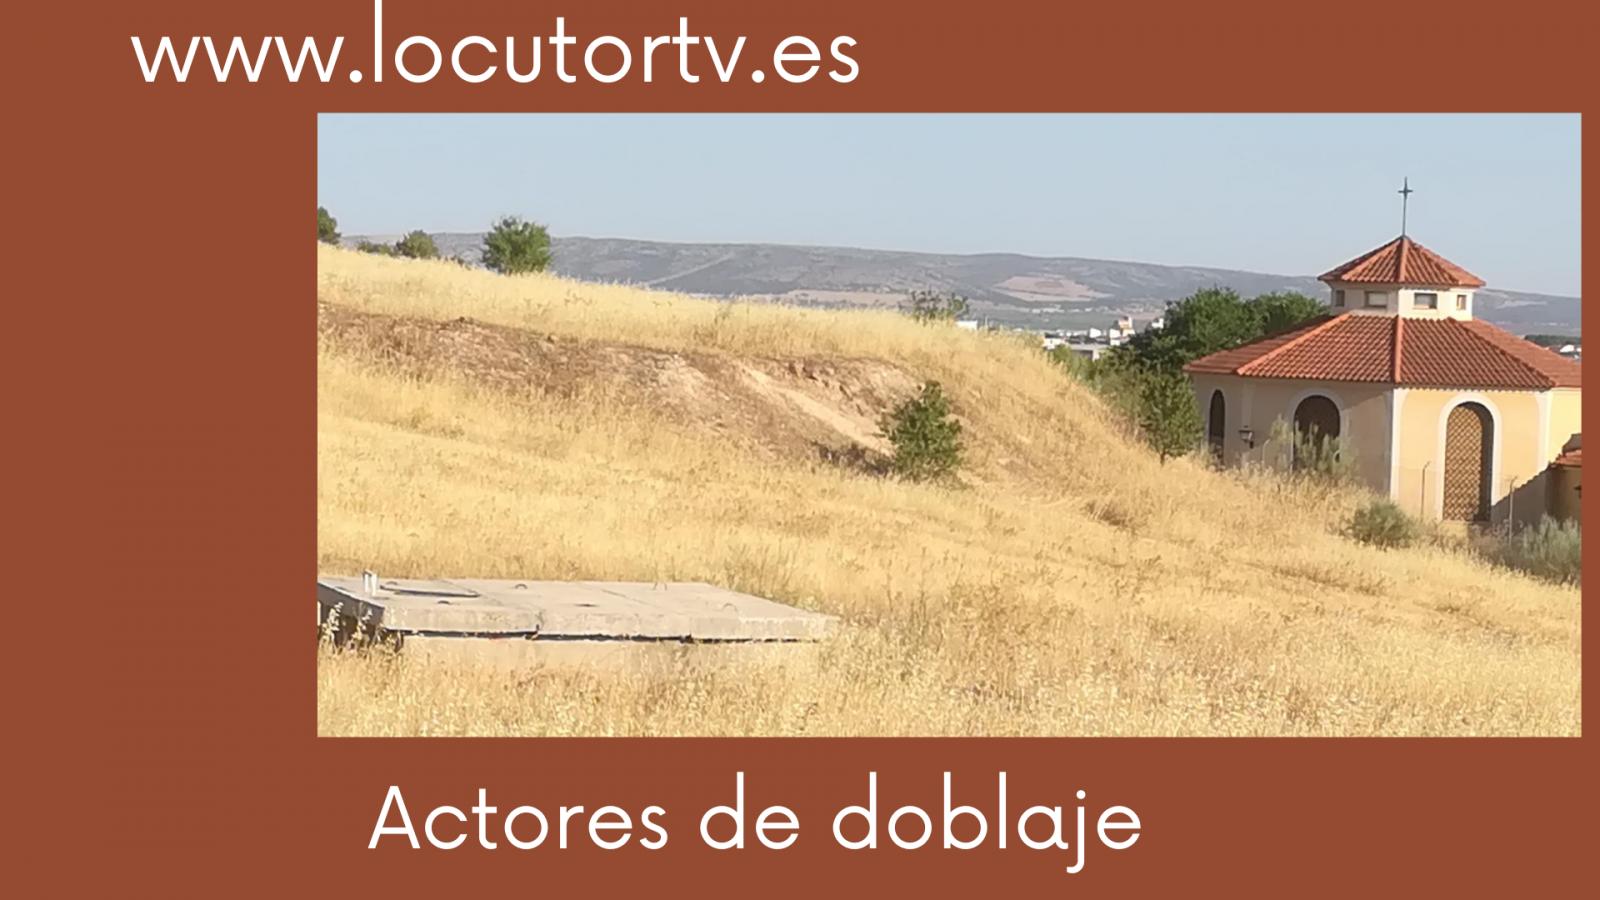 Actores de doblaje (6).png